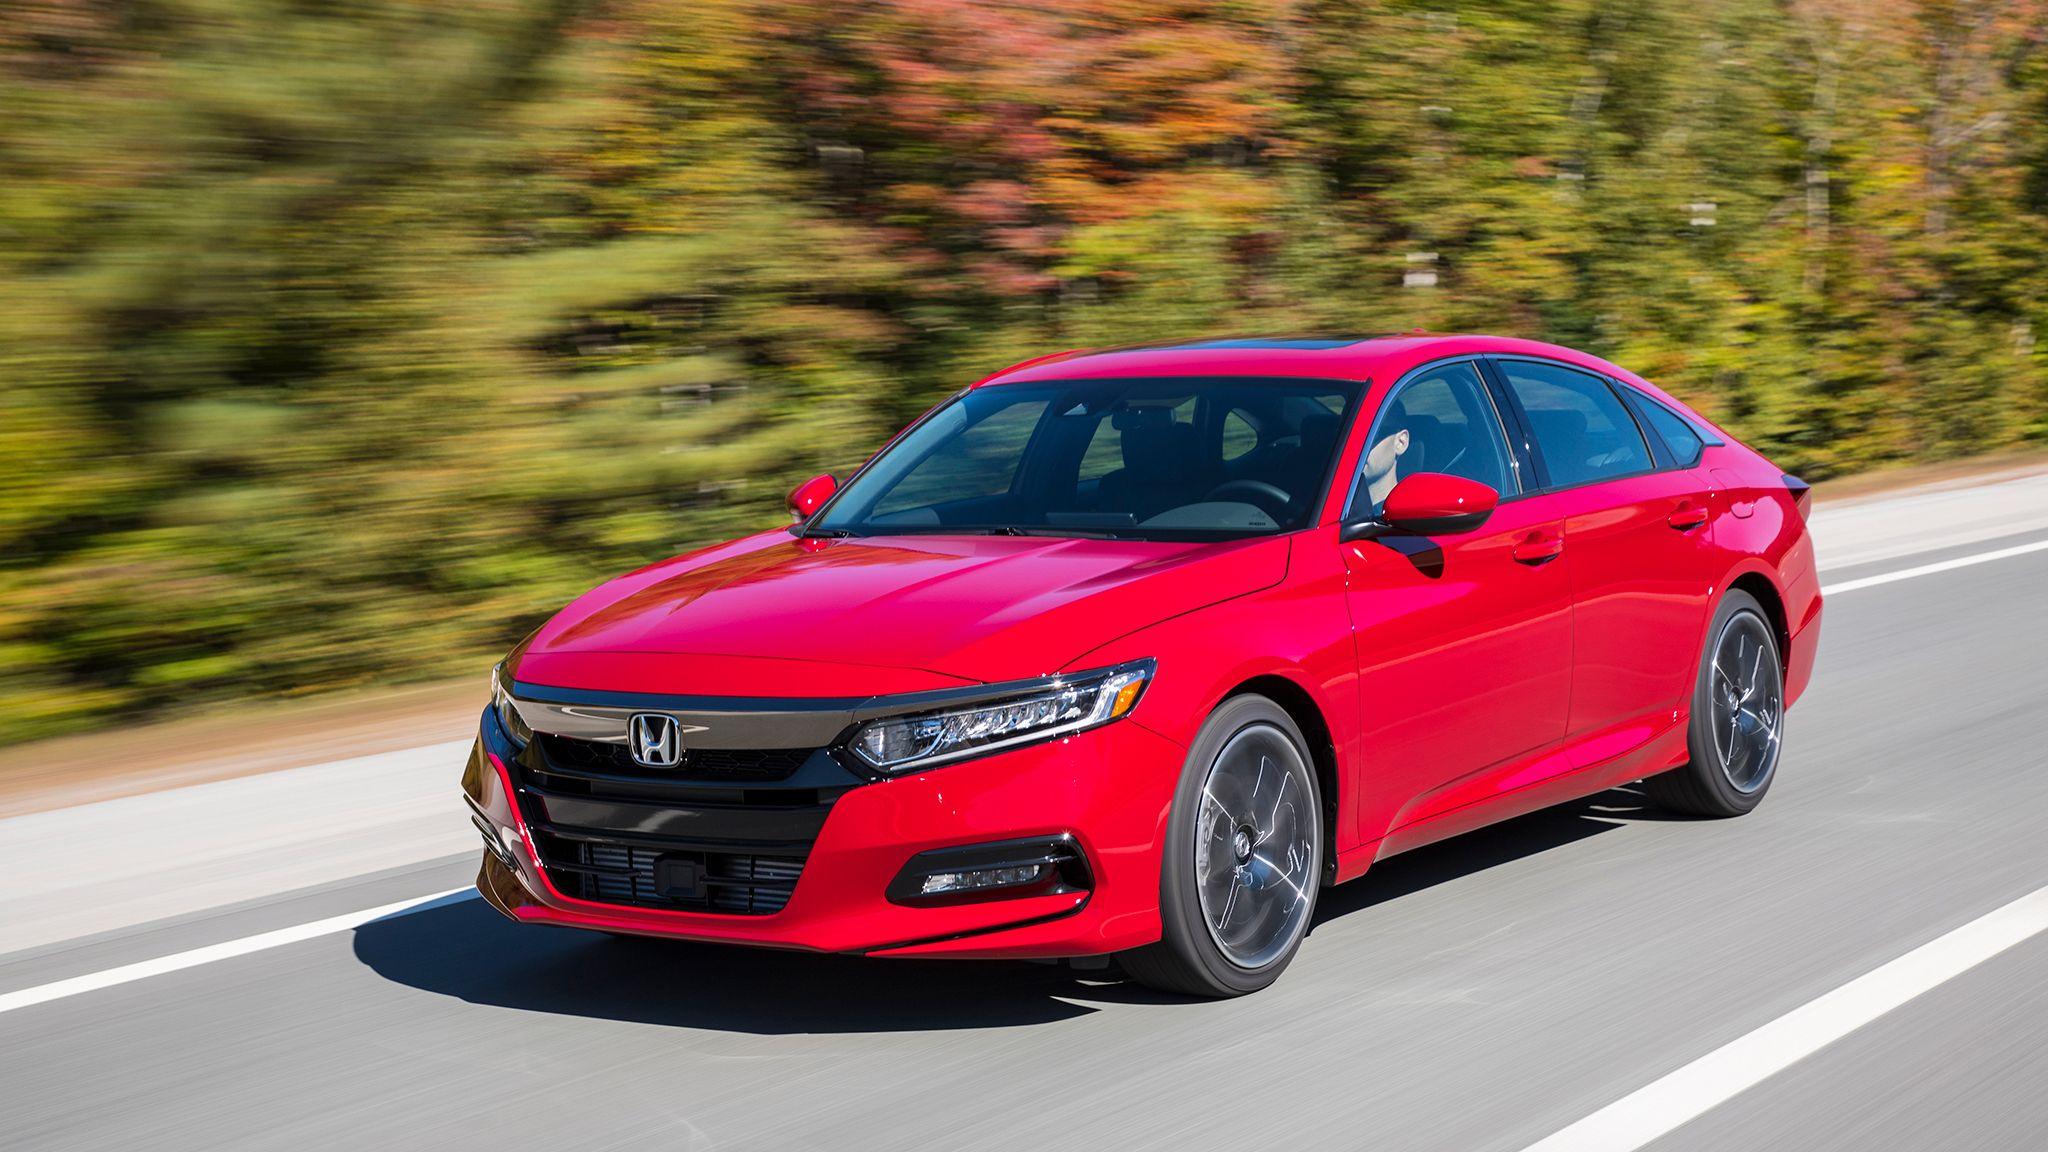 New Honda Accord 2020 Release Date Price Redesign Honda Accord Touring Honda Accord Coupe Honda Accord Sport